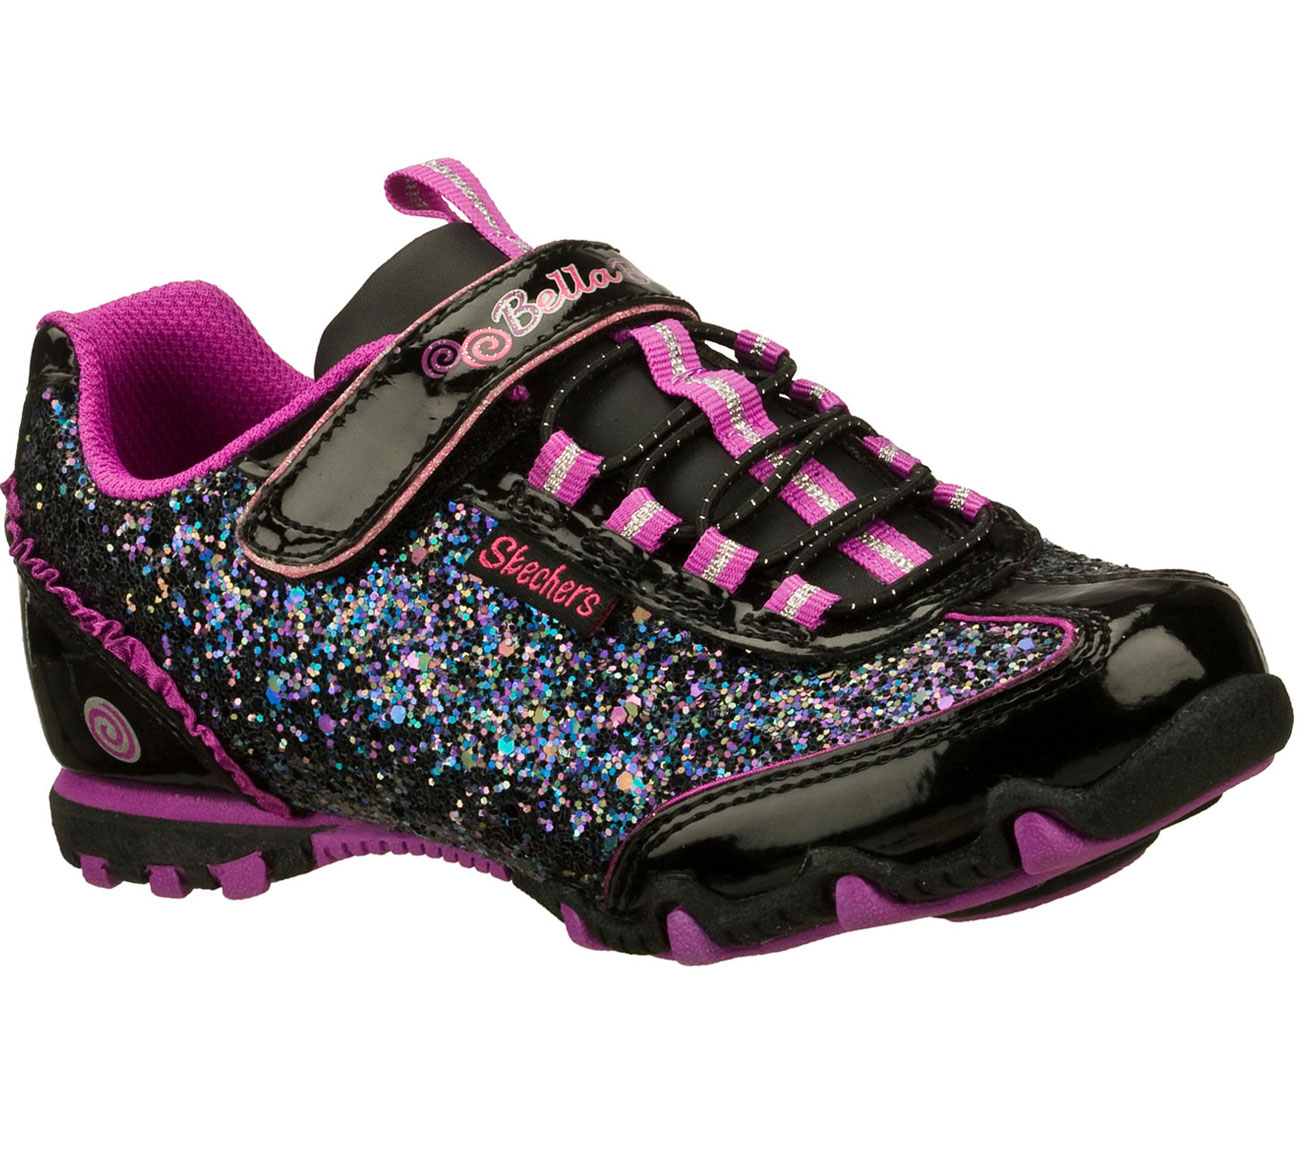 Bella Ballerina Shoes Size